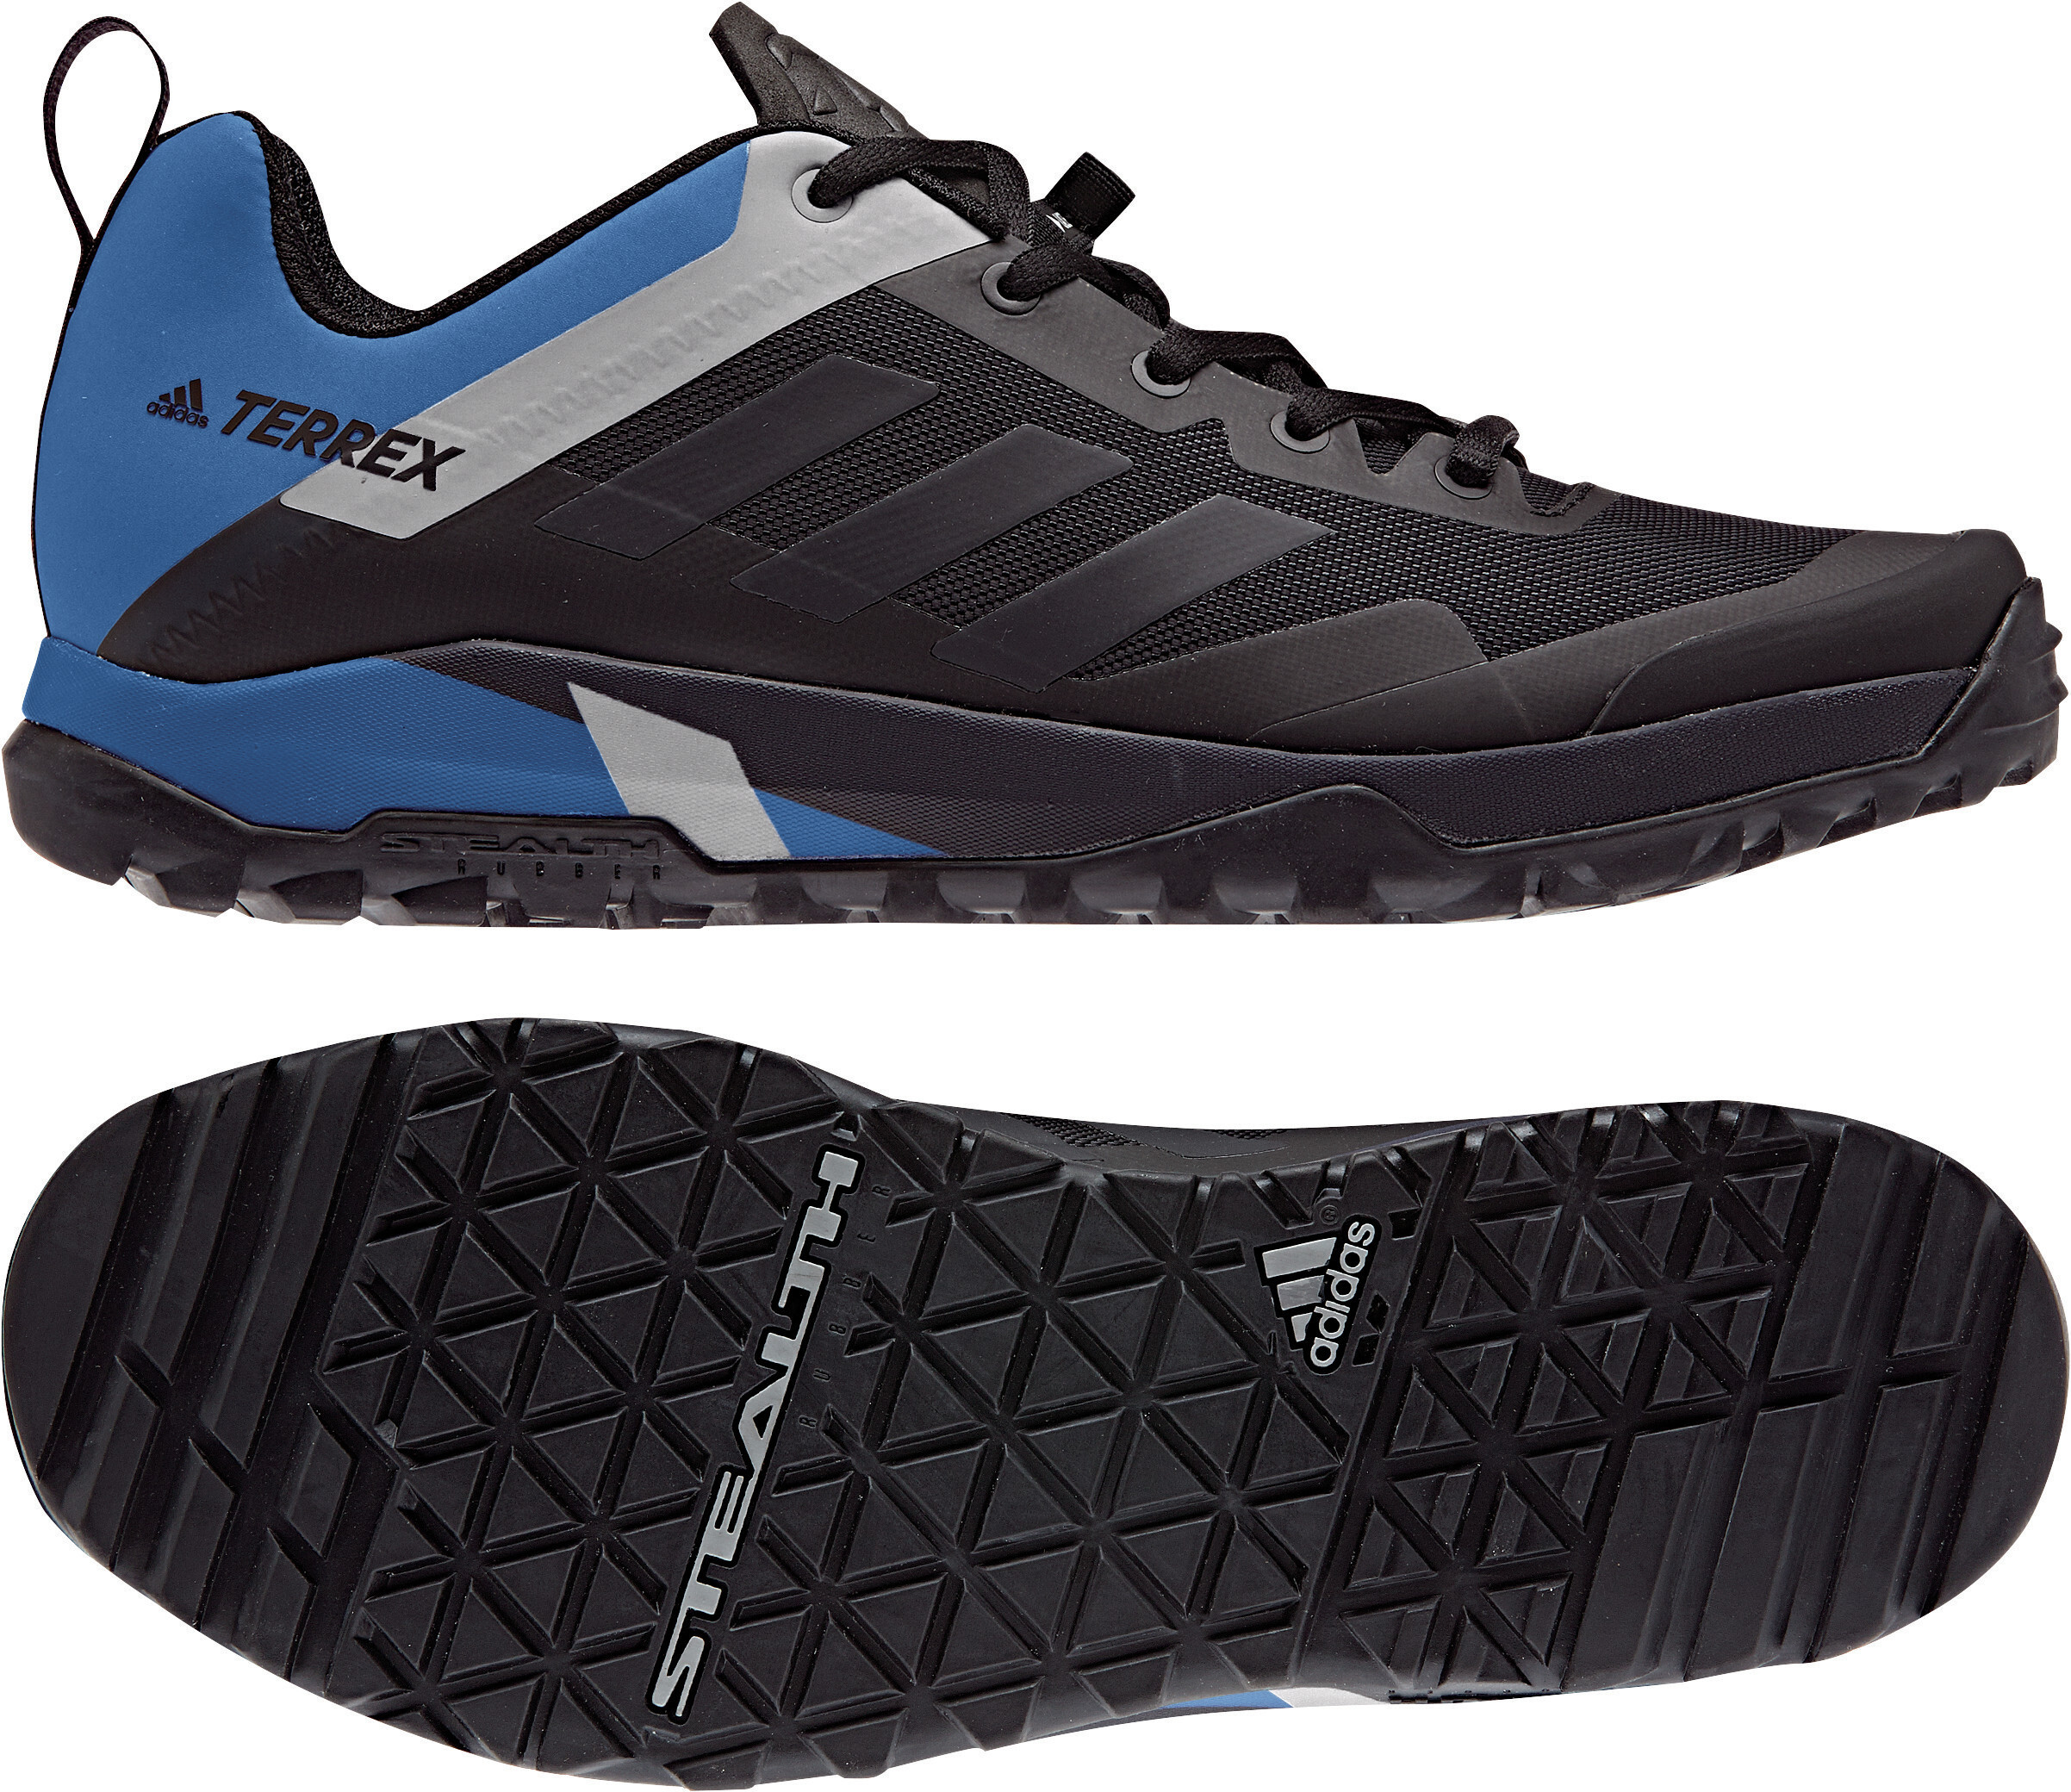 detailed look 61040 46530 adidas TERREX Trail Cross Sl Scarpe Uomo blu nero